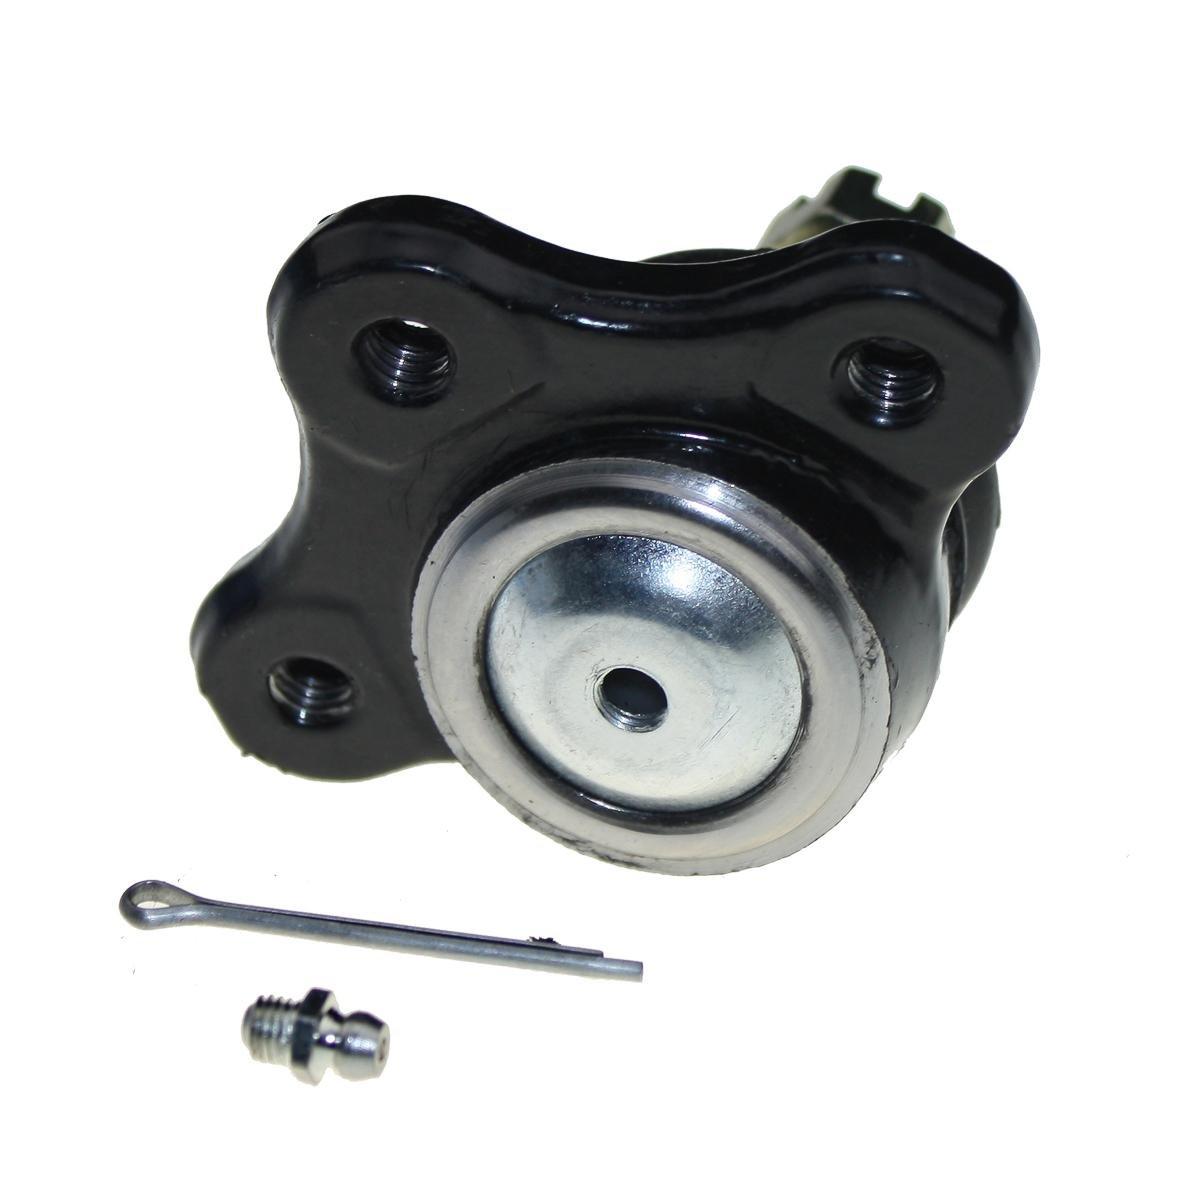 86-93 Mazda B2000 B2200 B2600 2WD 4 Pc Upper /& Lower Ball Joints Suspension Kit